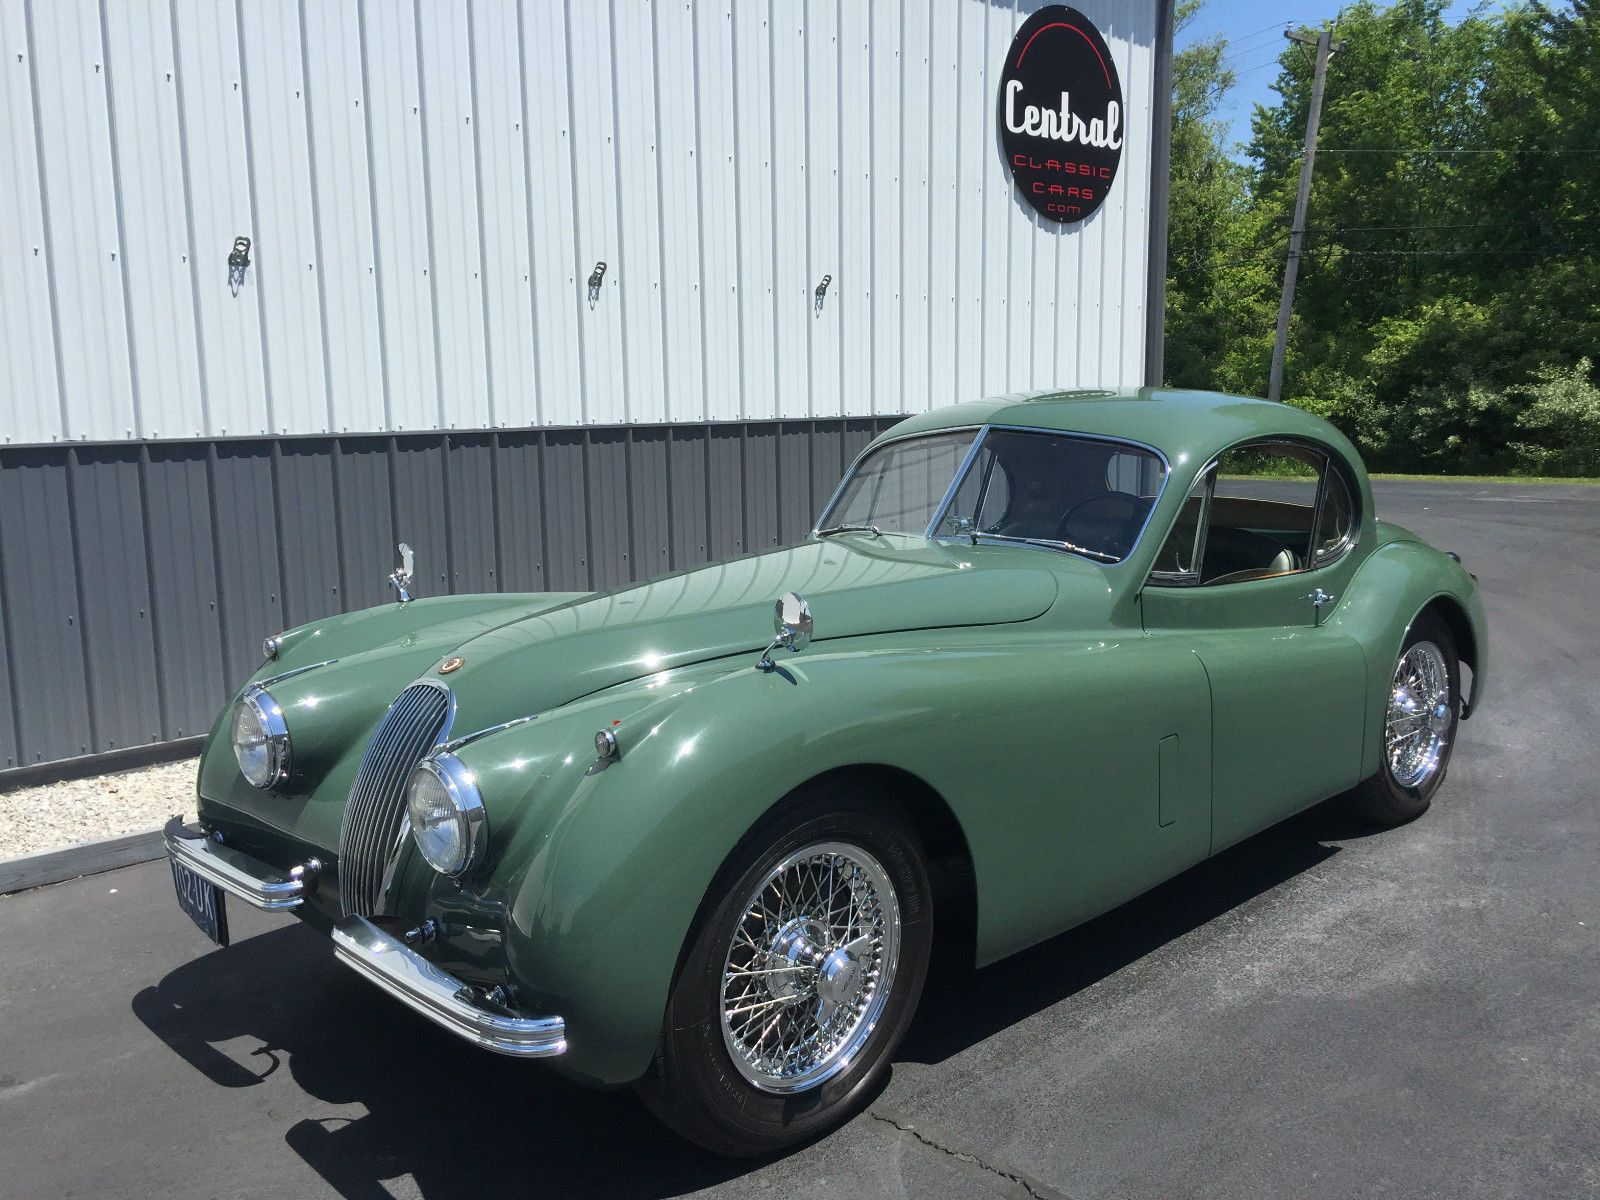 1953 Jaguar XK 2 door coupe | eBay Motors, Cars & Trucks, Jaguar ...